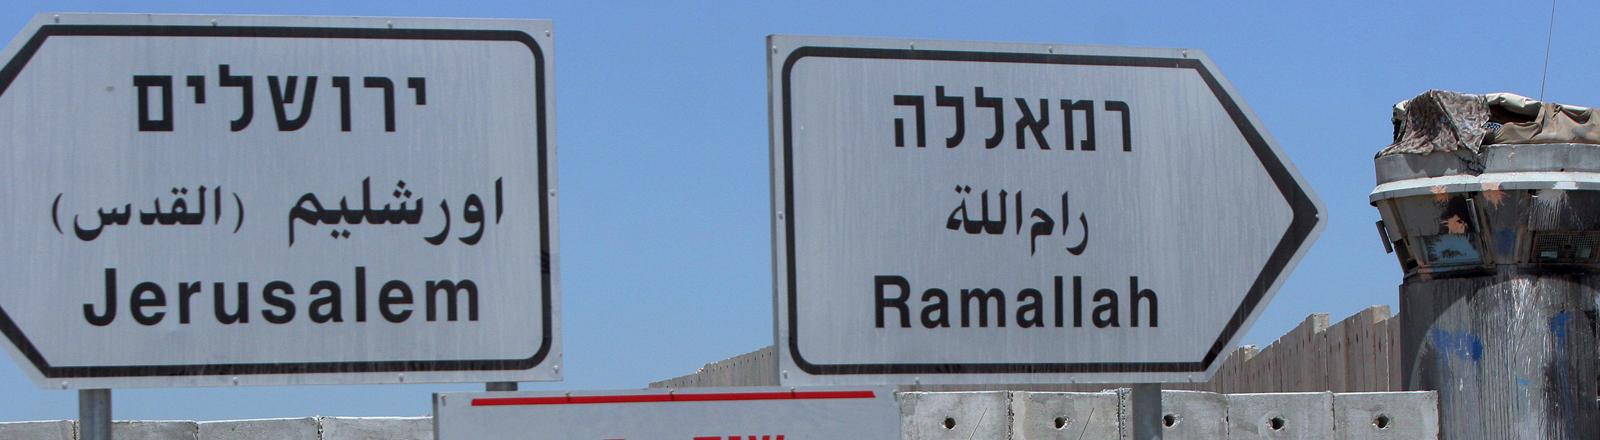 Wegweiser nach Jerusalem und Ramallah.